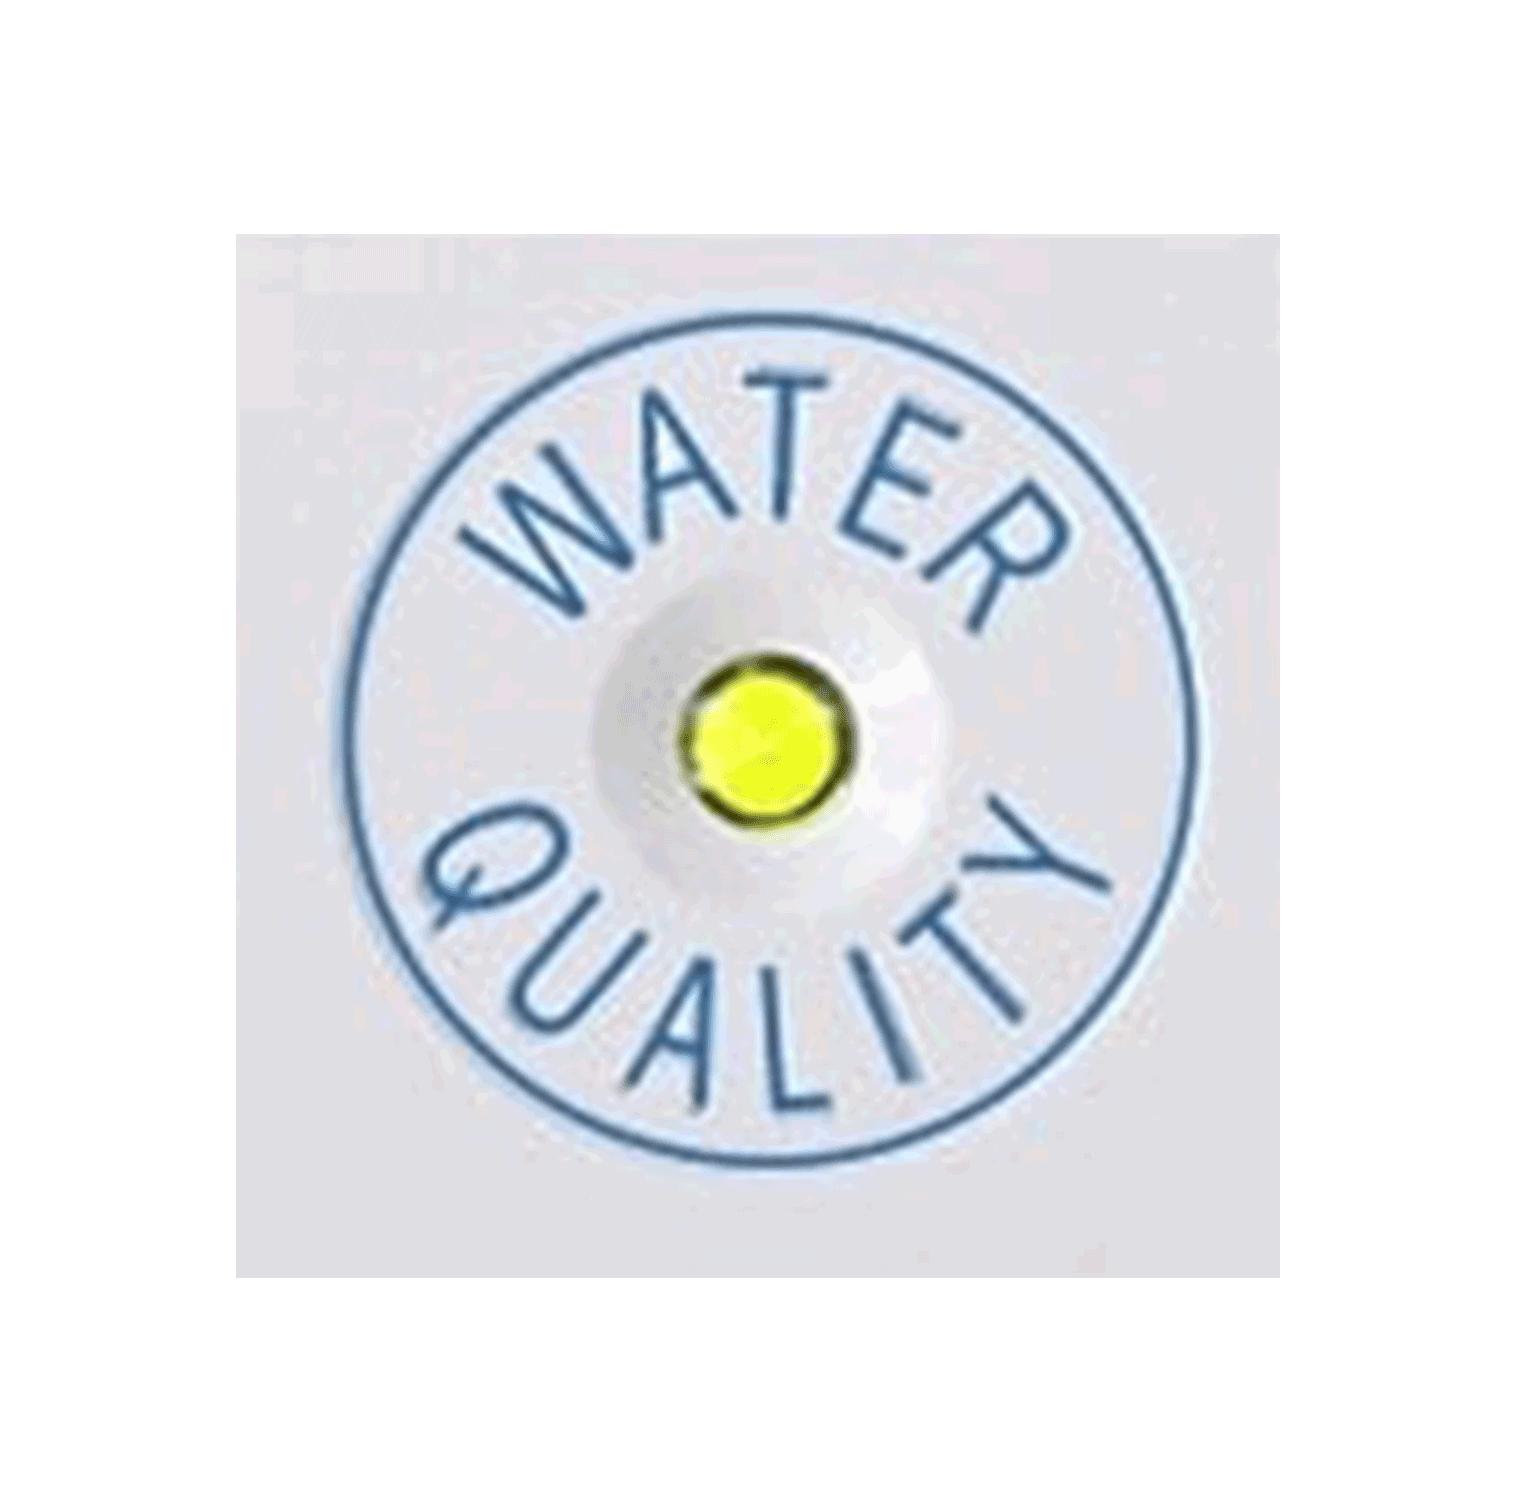 Portable Desalination Rainman watermaker operations